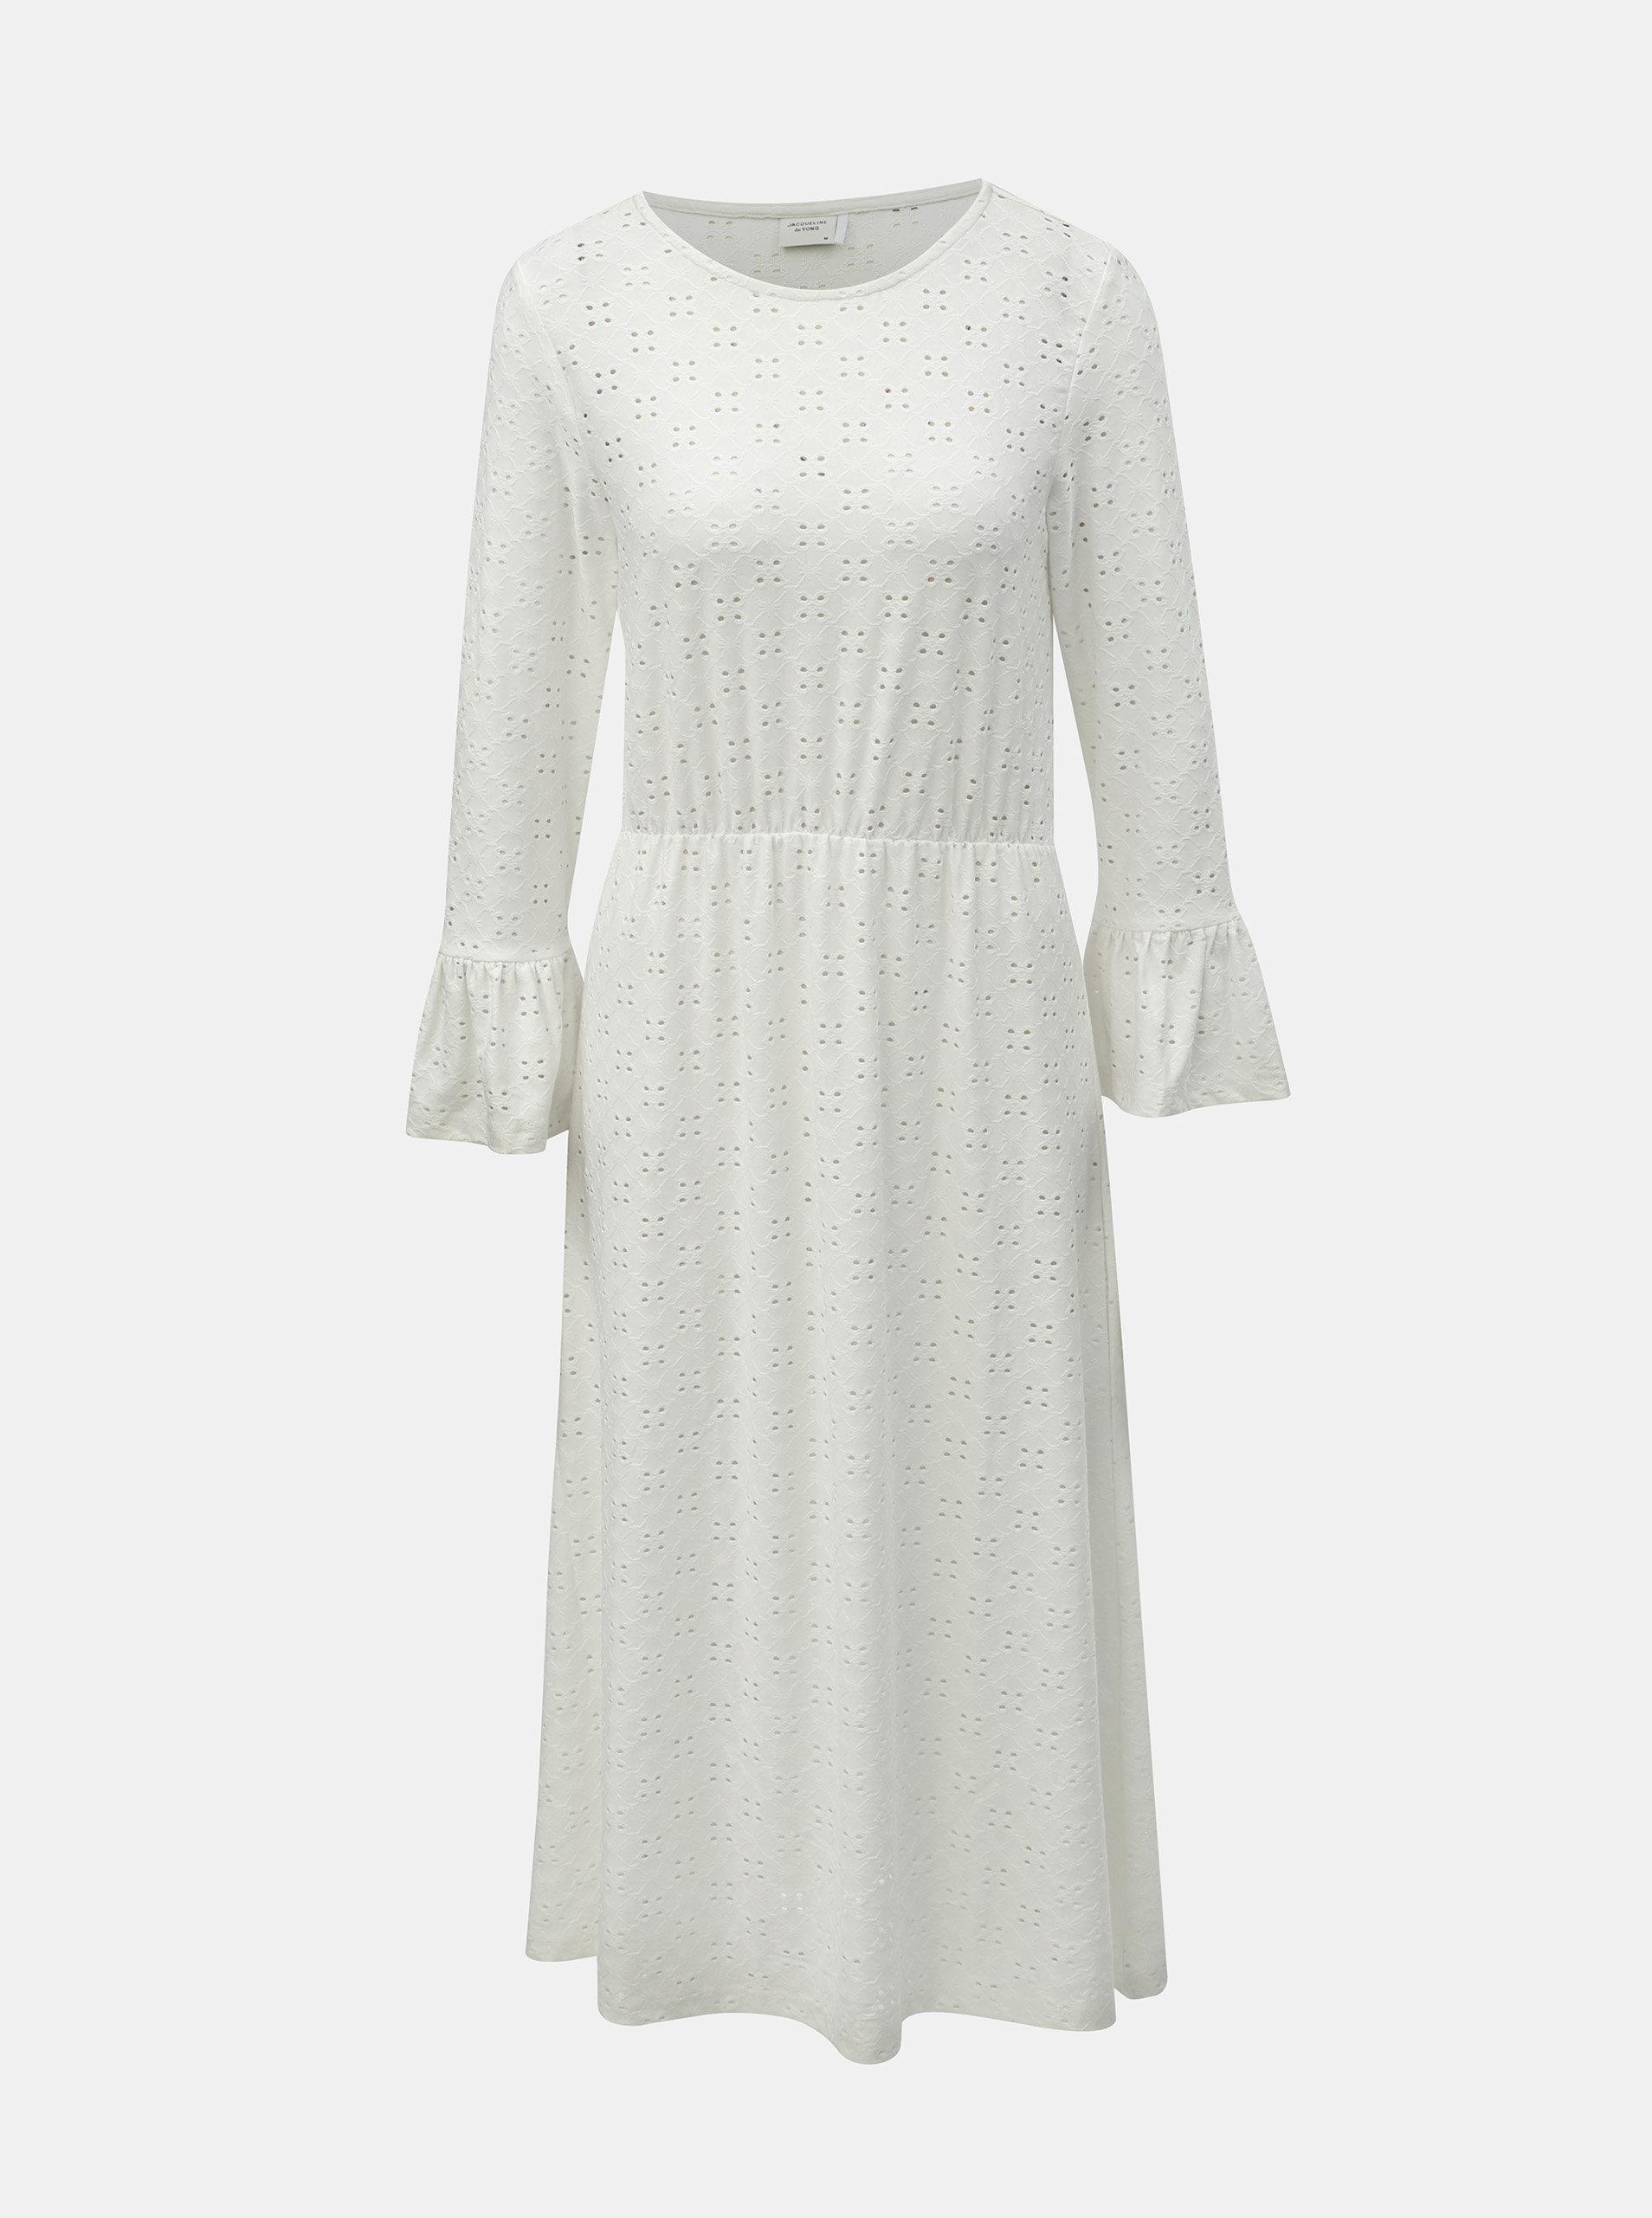 480f062aa24b Biele šaty Jacqueline de Yong Cathinka ...